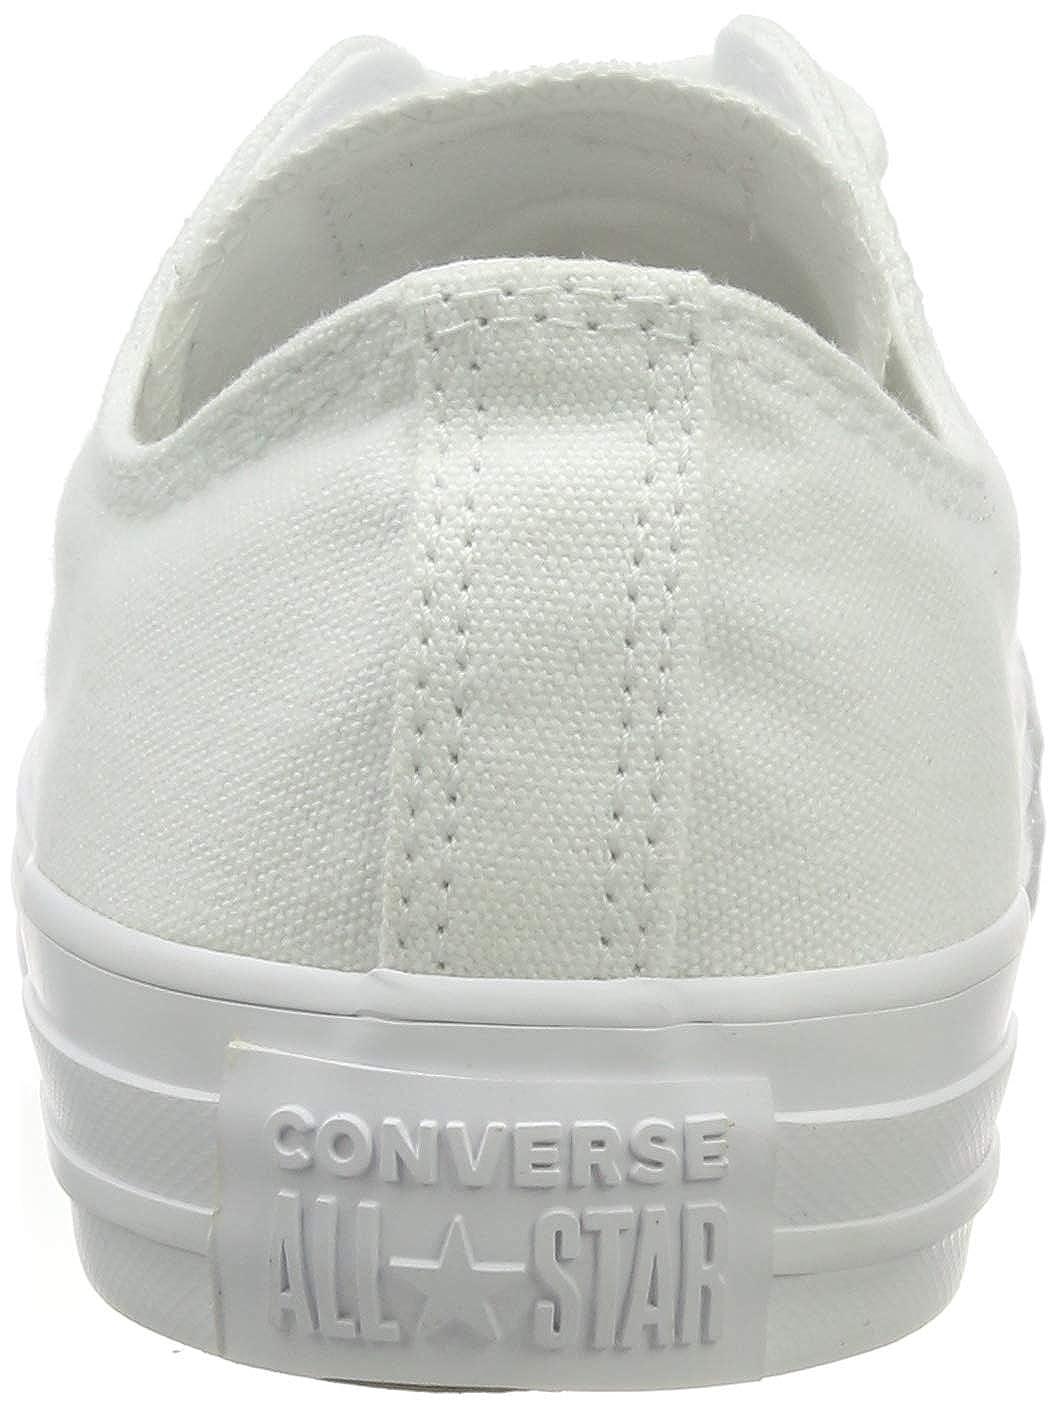 Converse Unisex-Erwachsene Chuck Taylor All Star Seasonal Turnschuhe Weiß